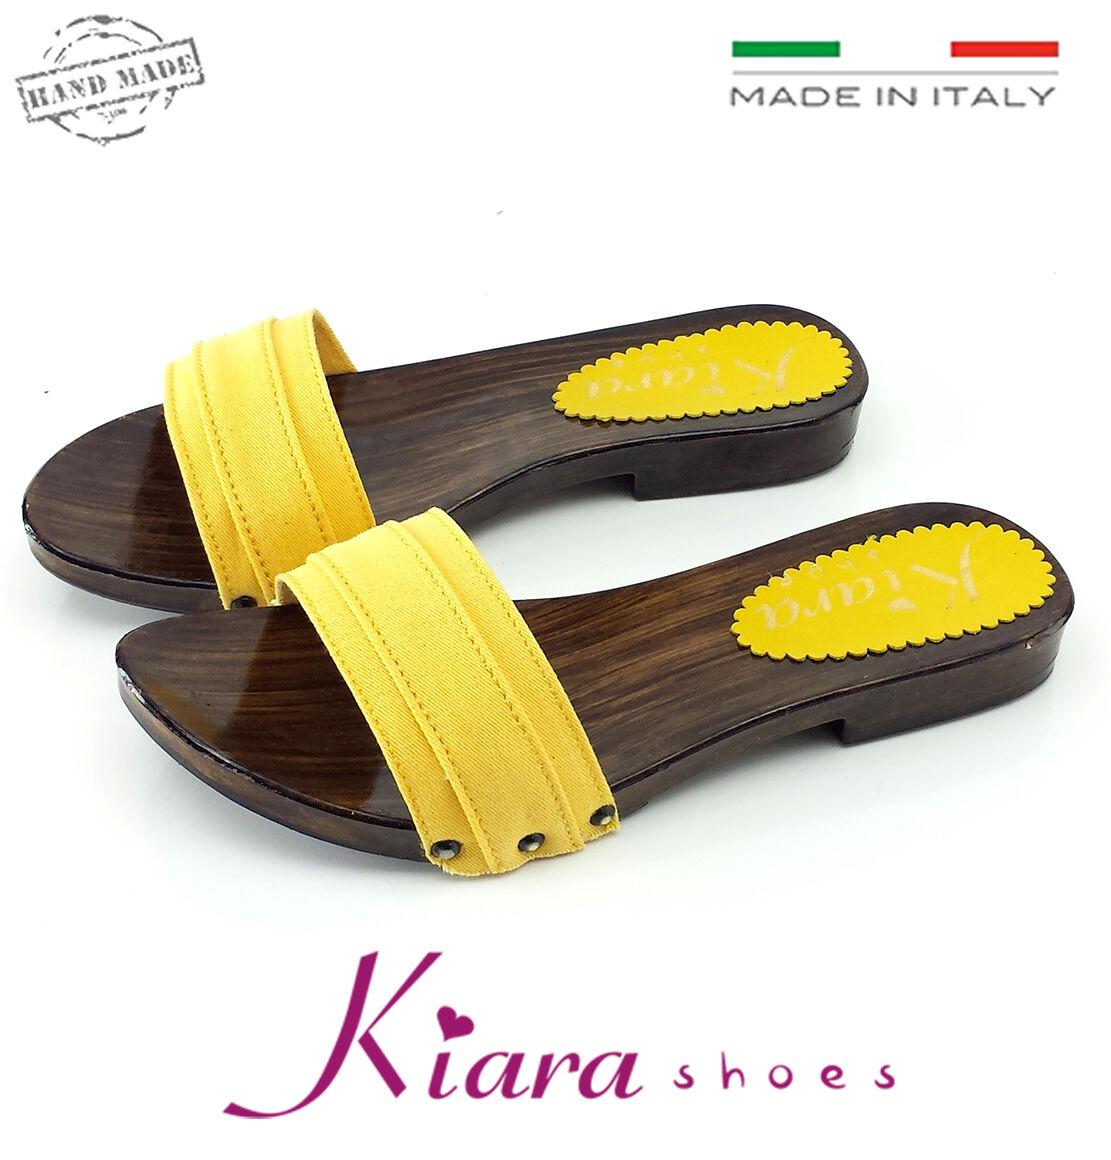 Sabots Basses Jaune- Chaussures Made in  35-36-37-38-39-40-41-42 Talon 2 cm